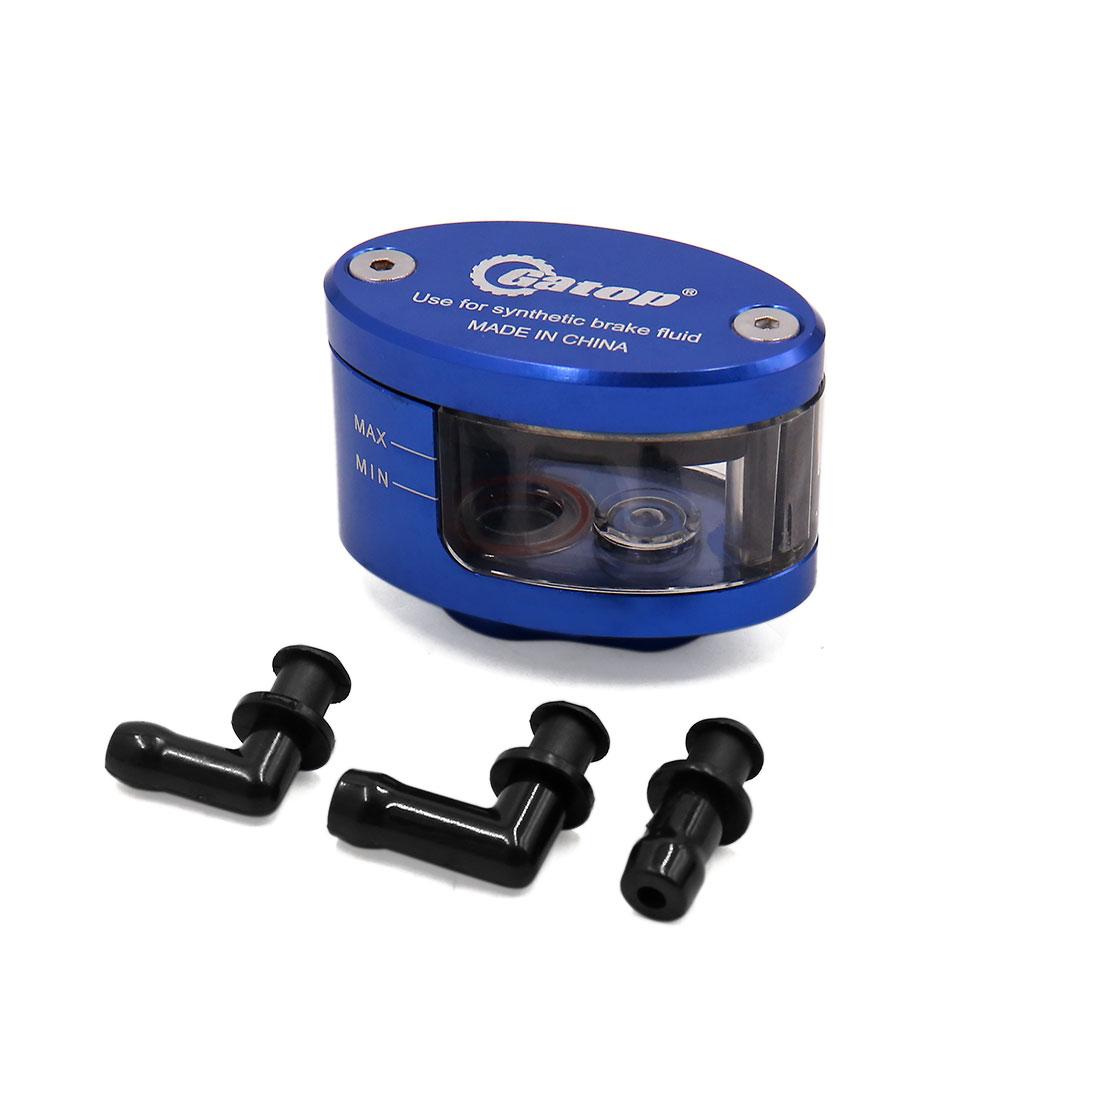 Blue CNC Front Brake Clutch Master Fluid Reservoir Oil Cup for Motorcycle